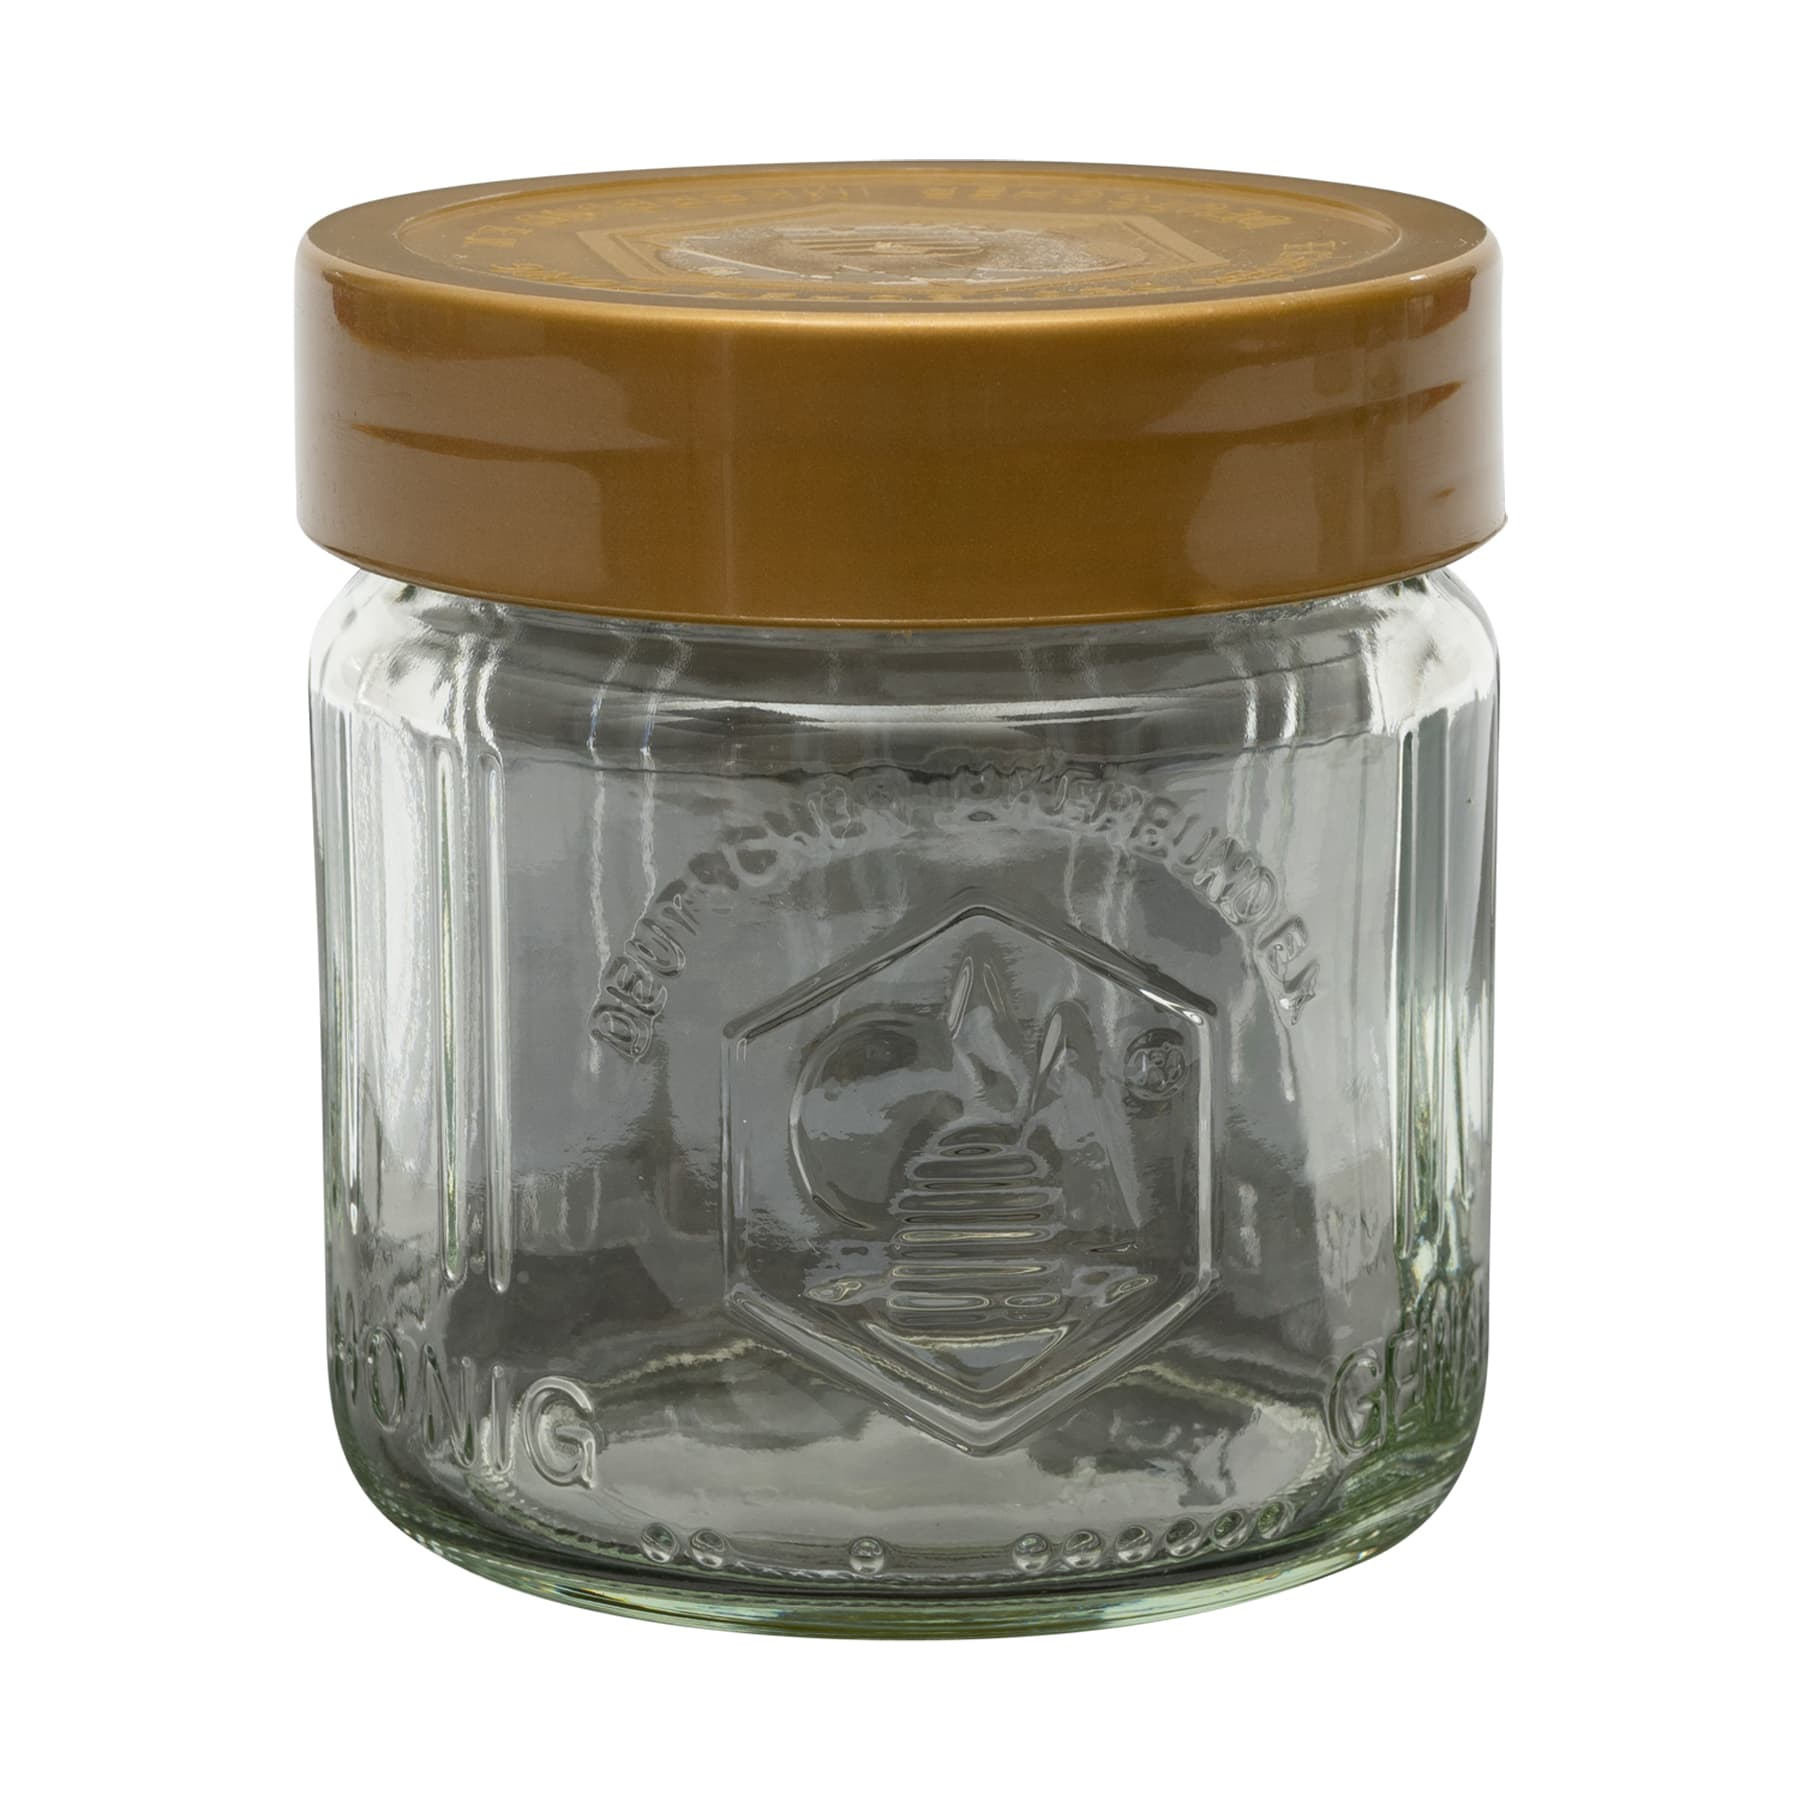 DIB-Gläser 250 g 1 PAL(4284 St.) inkl. Deckel u. Umkarton, bundesweit FREI HAUS